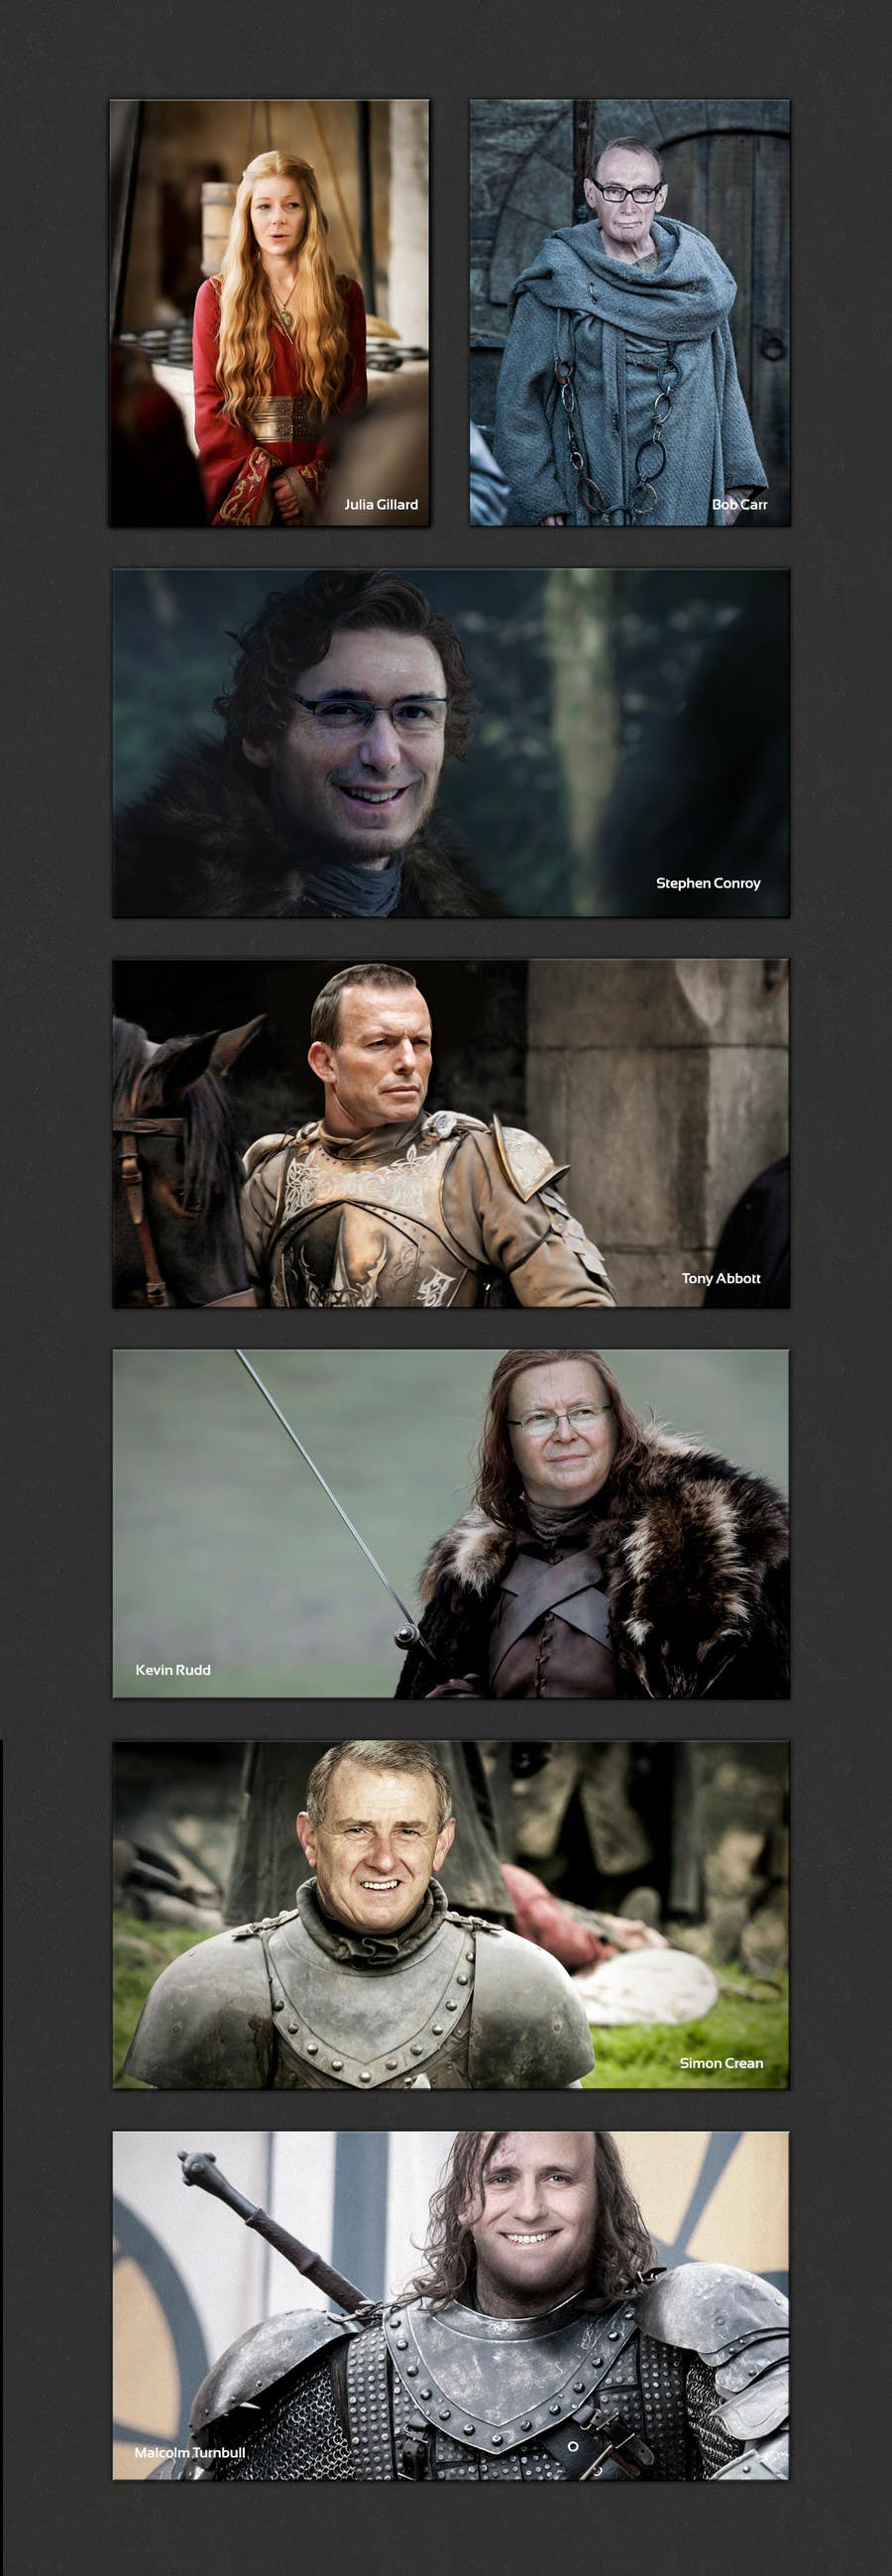 #128 para Photoshop Aussie Politicians into Game of Thrones Mashup de softechnos5